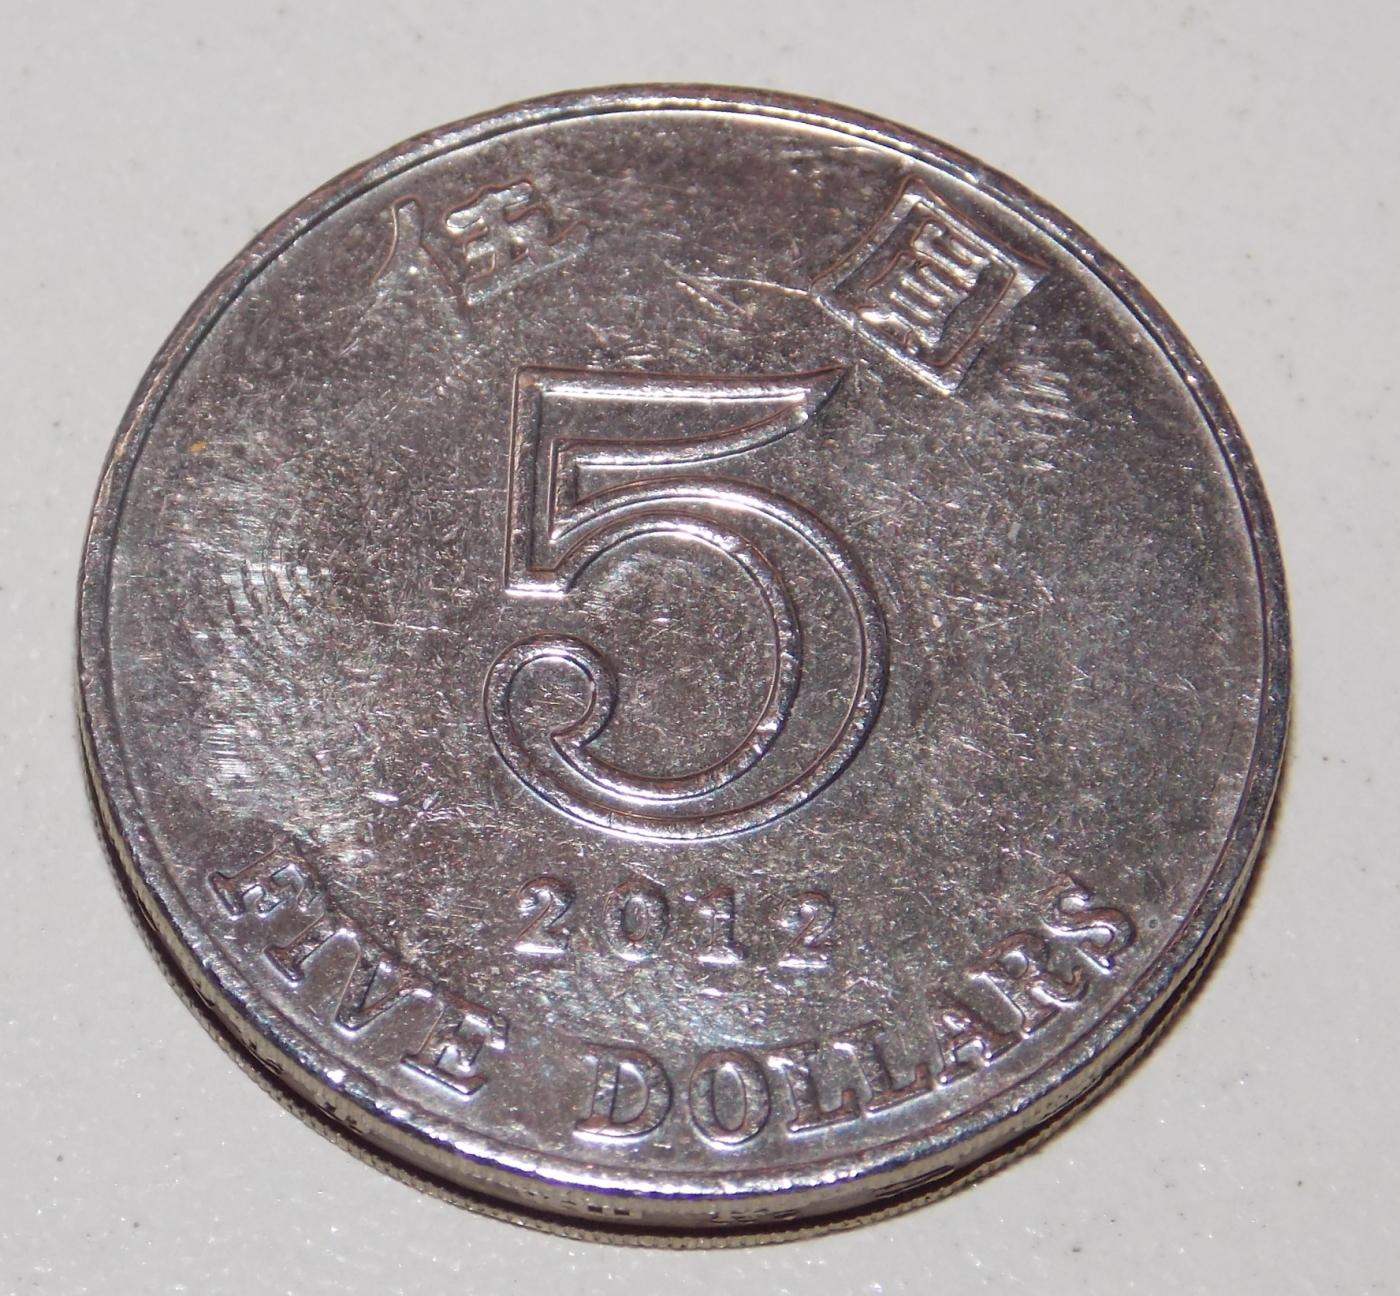 5 Dollars 2017